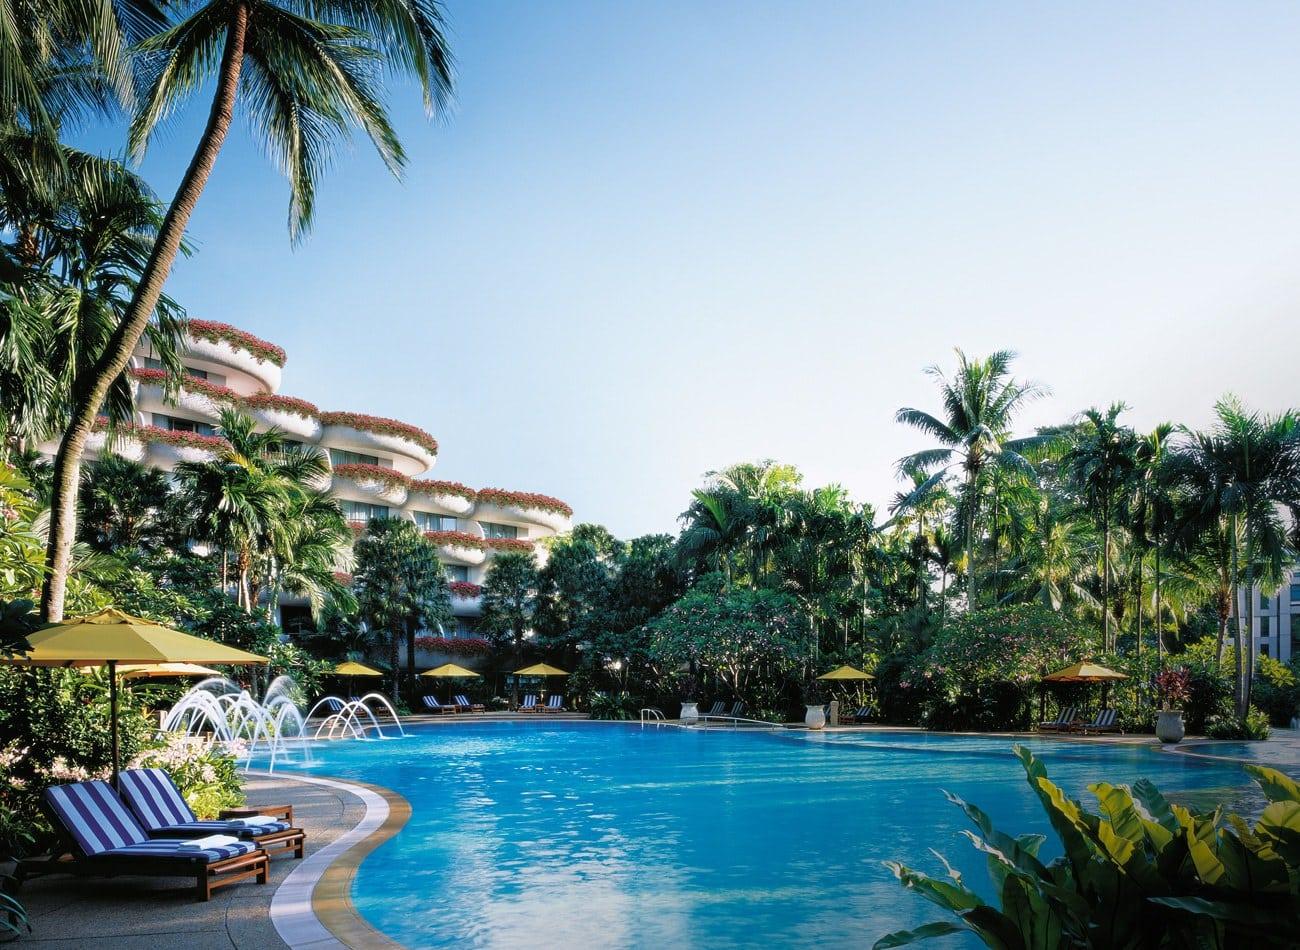 Shangri-la Singapore swimming pool